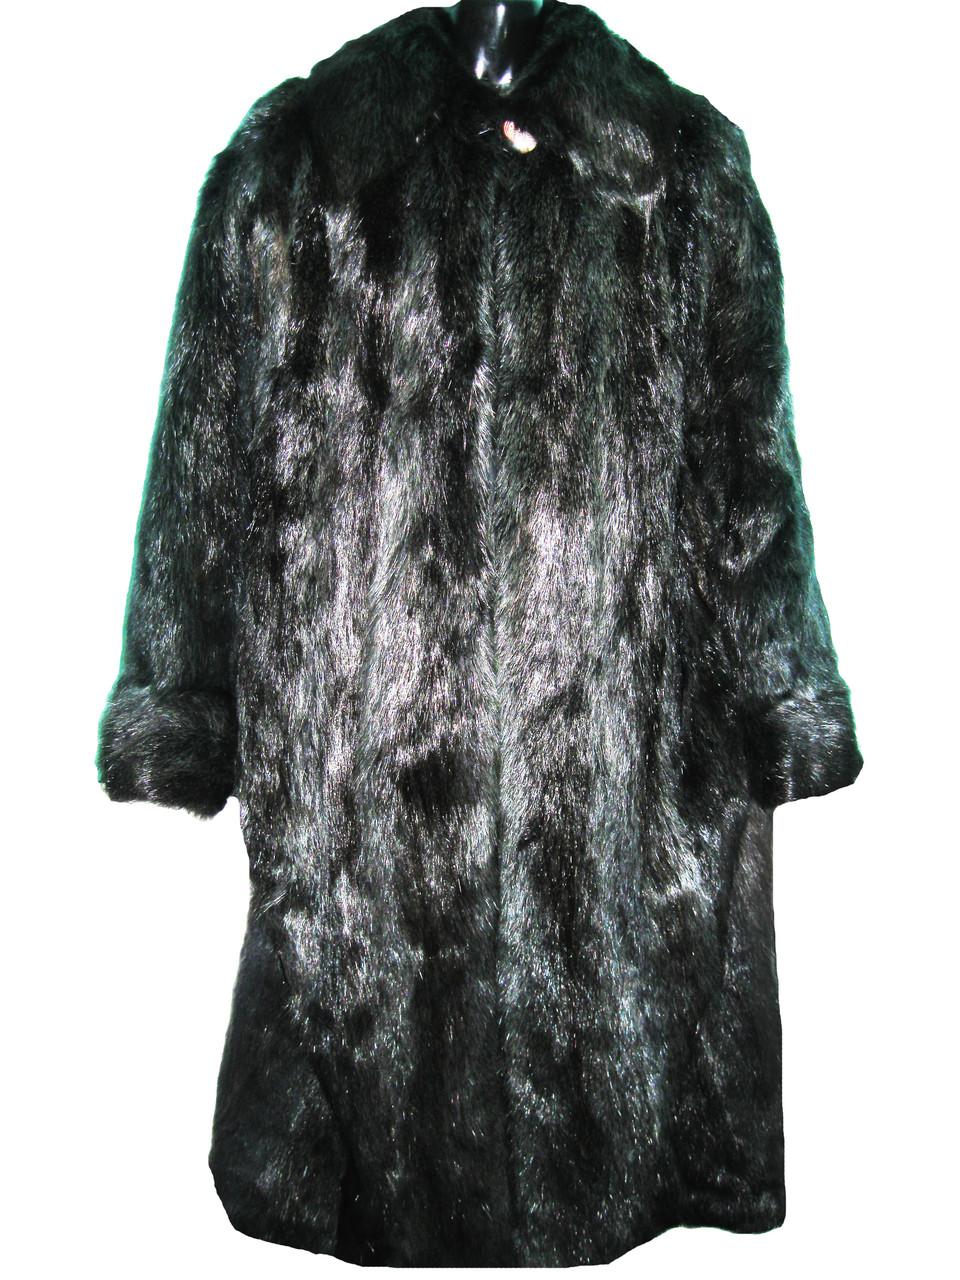 Шуба женская натуральная (мех нутрии), размер XL, арт. Ш-05